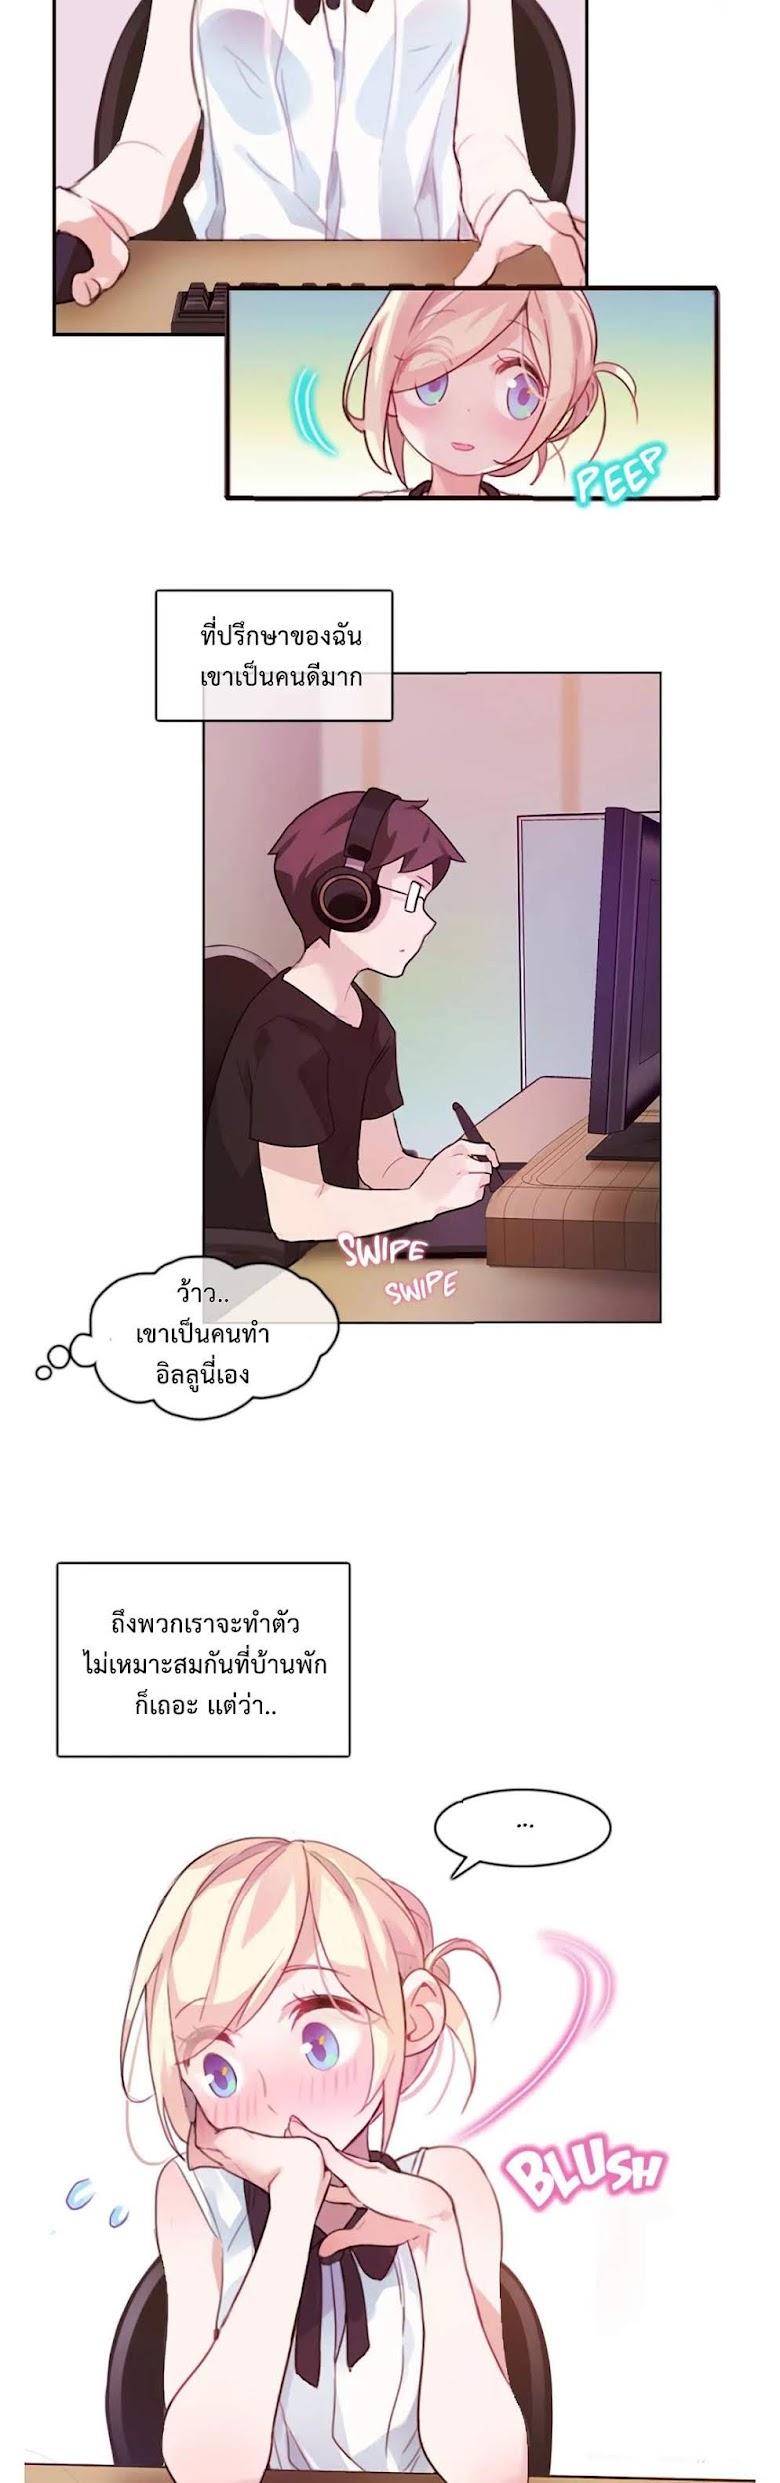 A Pervert s Daily Life - หน้า 20